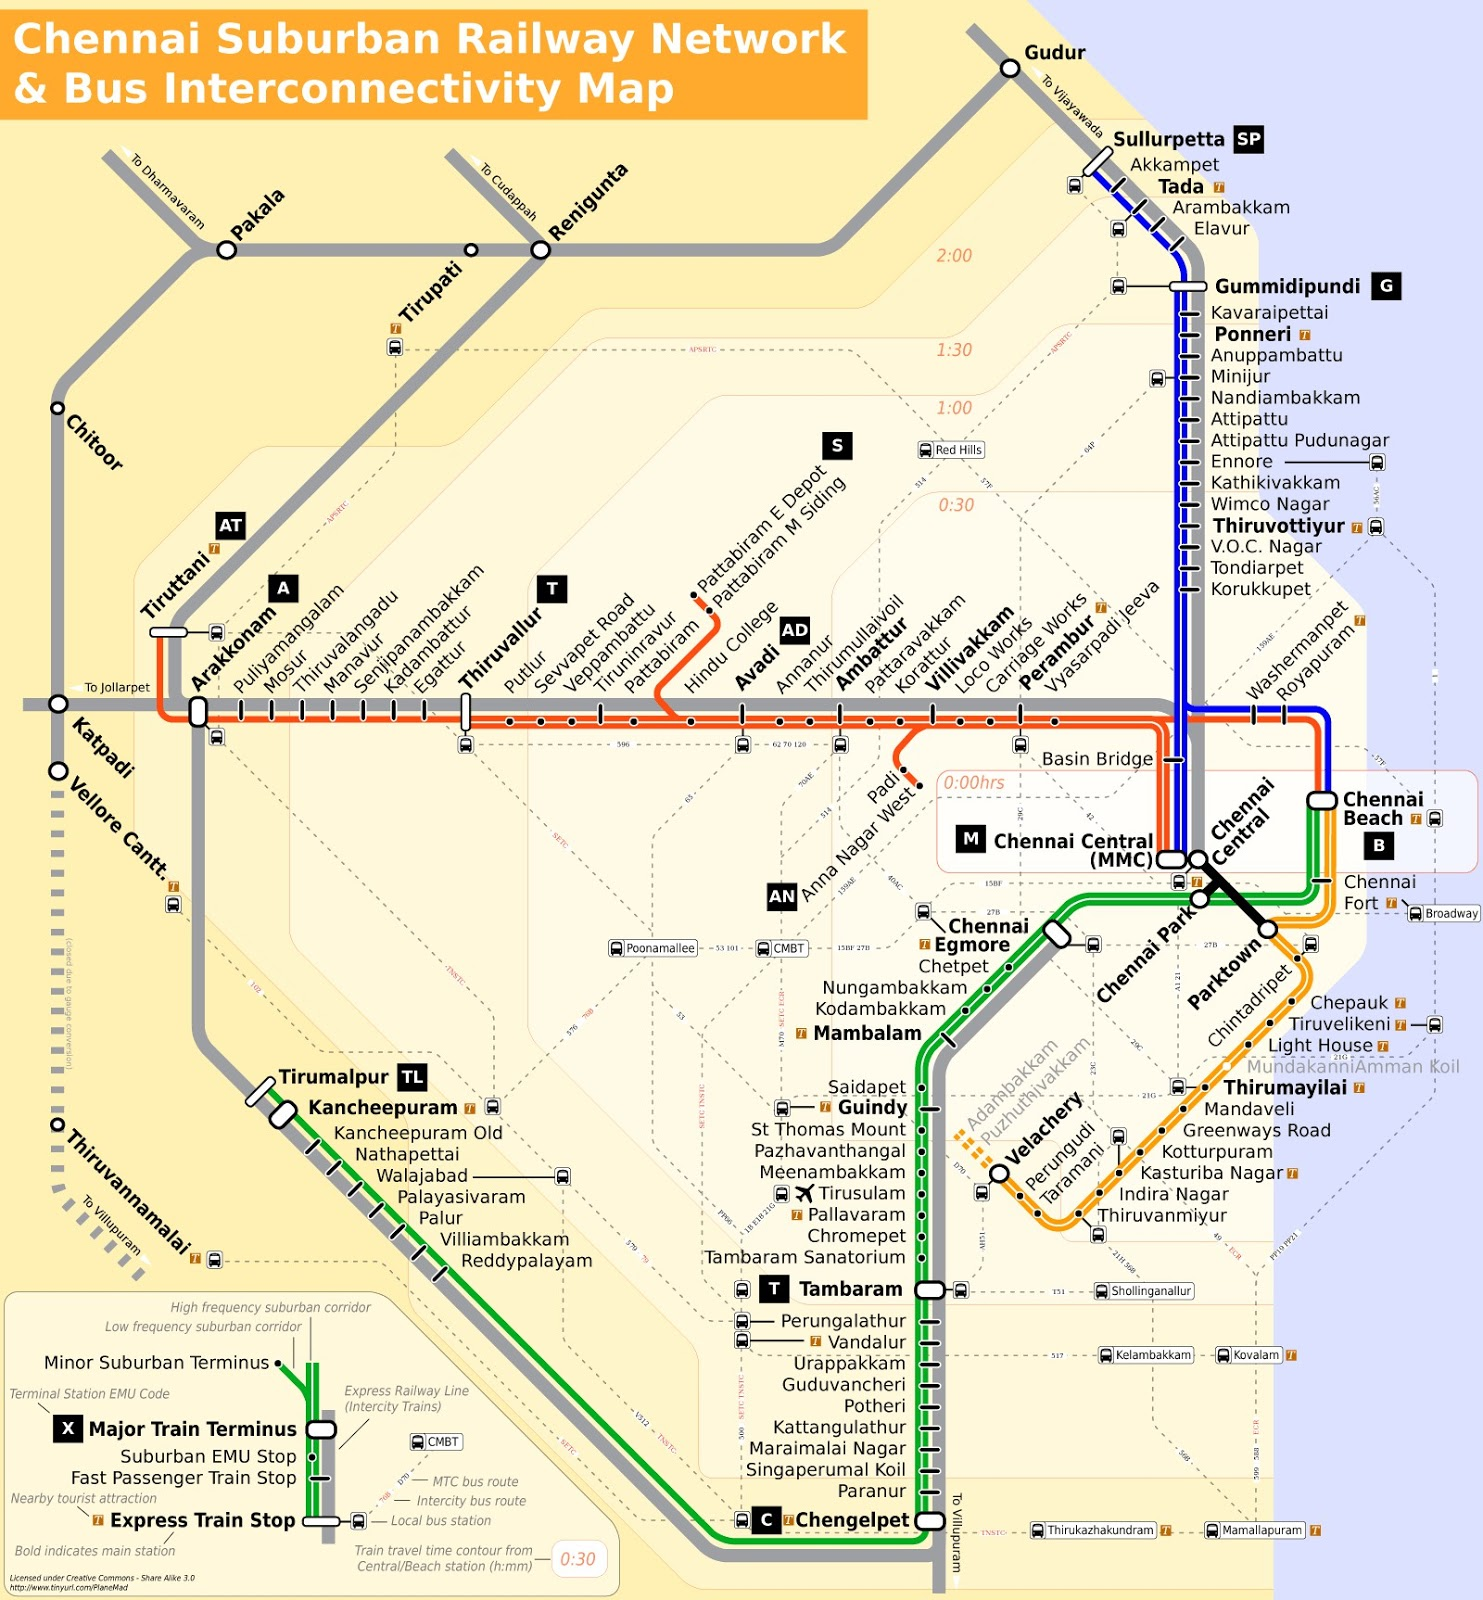 chennai suburban rail and bus interconnectivity map